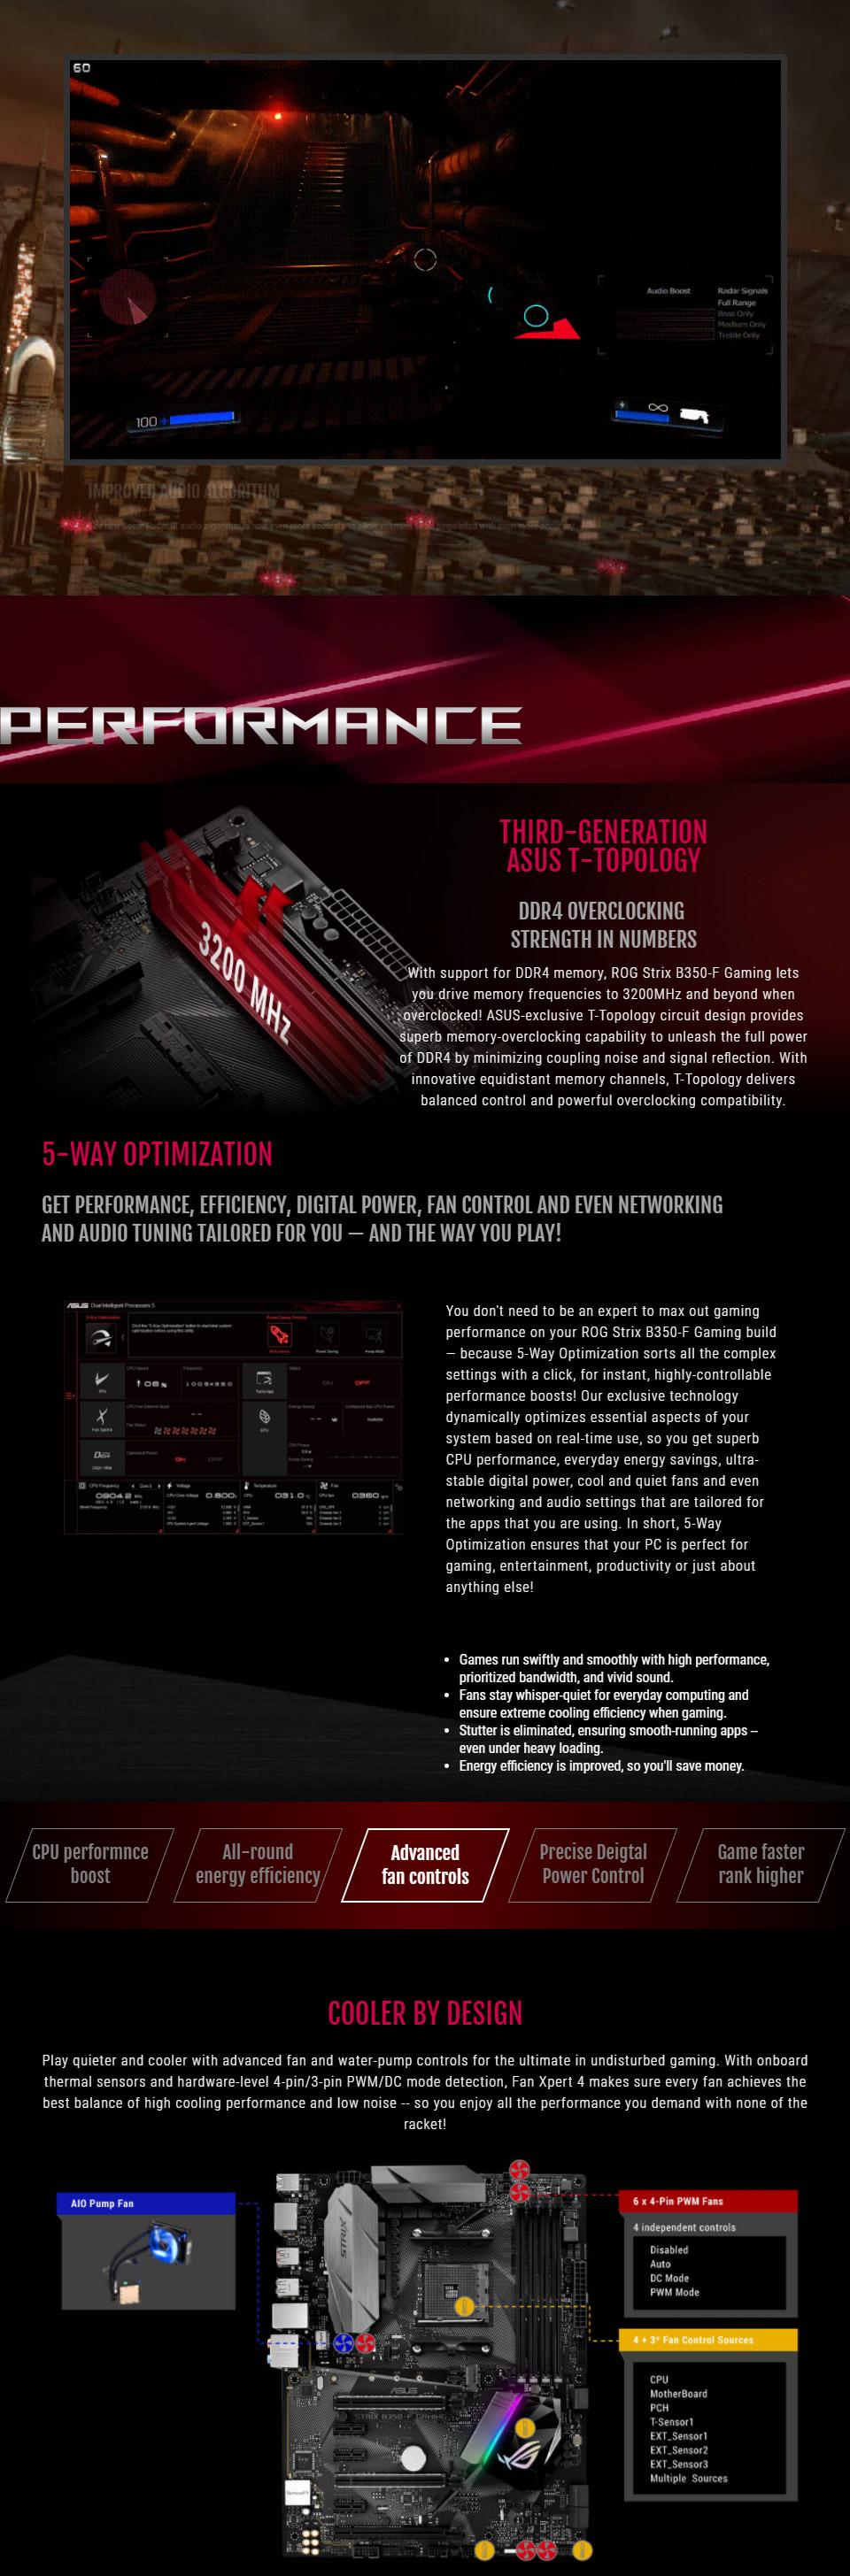 ASUS ROG Strix B350-F Motherboard [ROG-STRIX-B350-F-GAMING